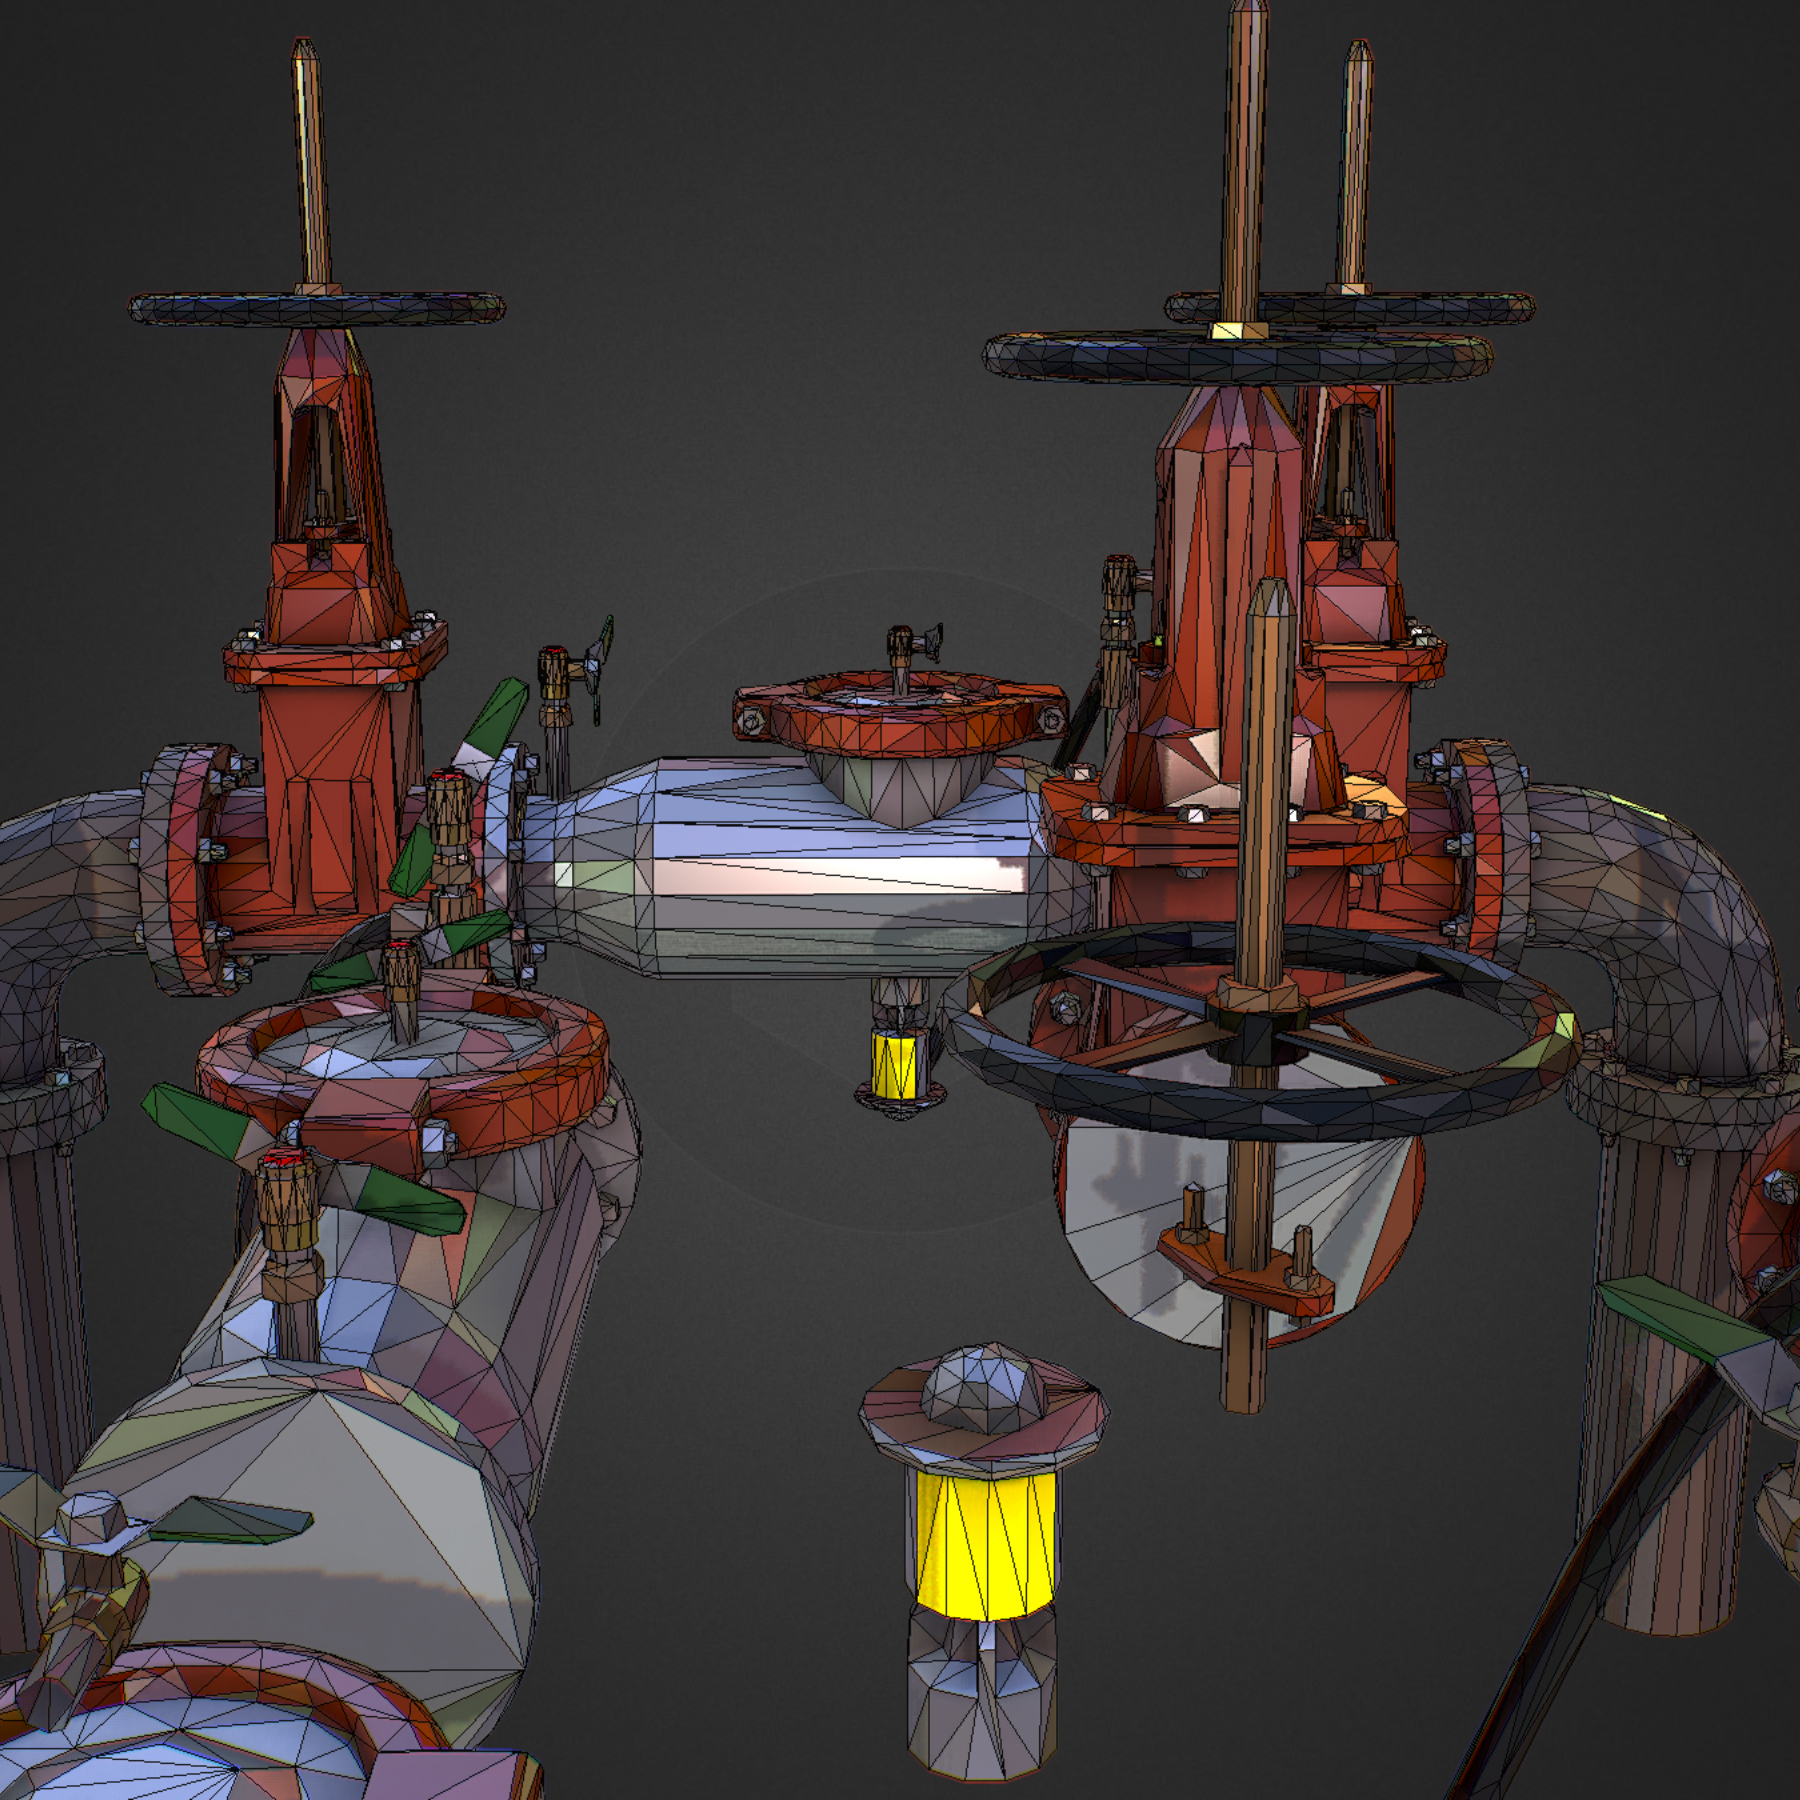 Low Poly ART Backflow Water Pipe Constructor 3d model max 3ds max plugin fbx ma mb tga targa icb vda vst pix obj 272574